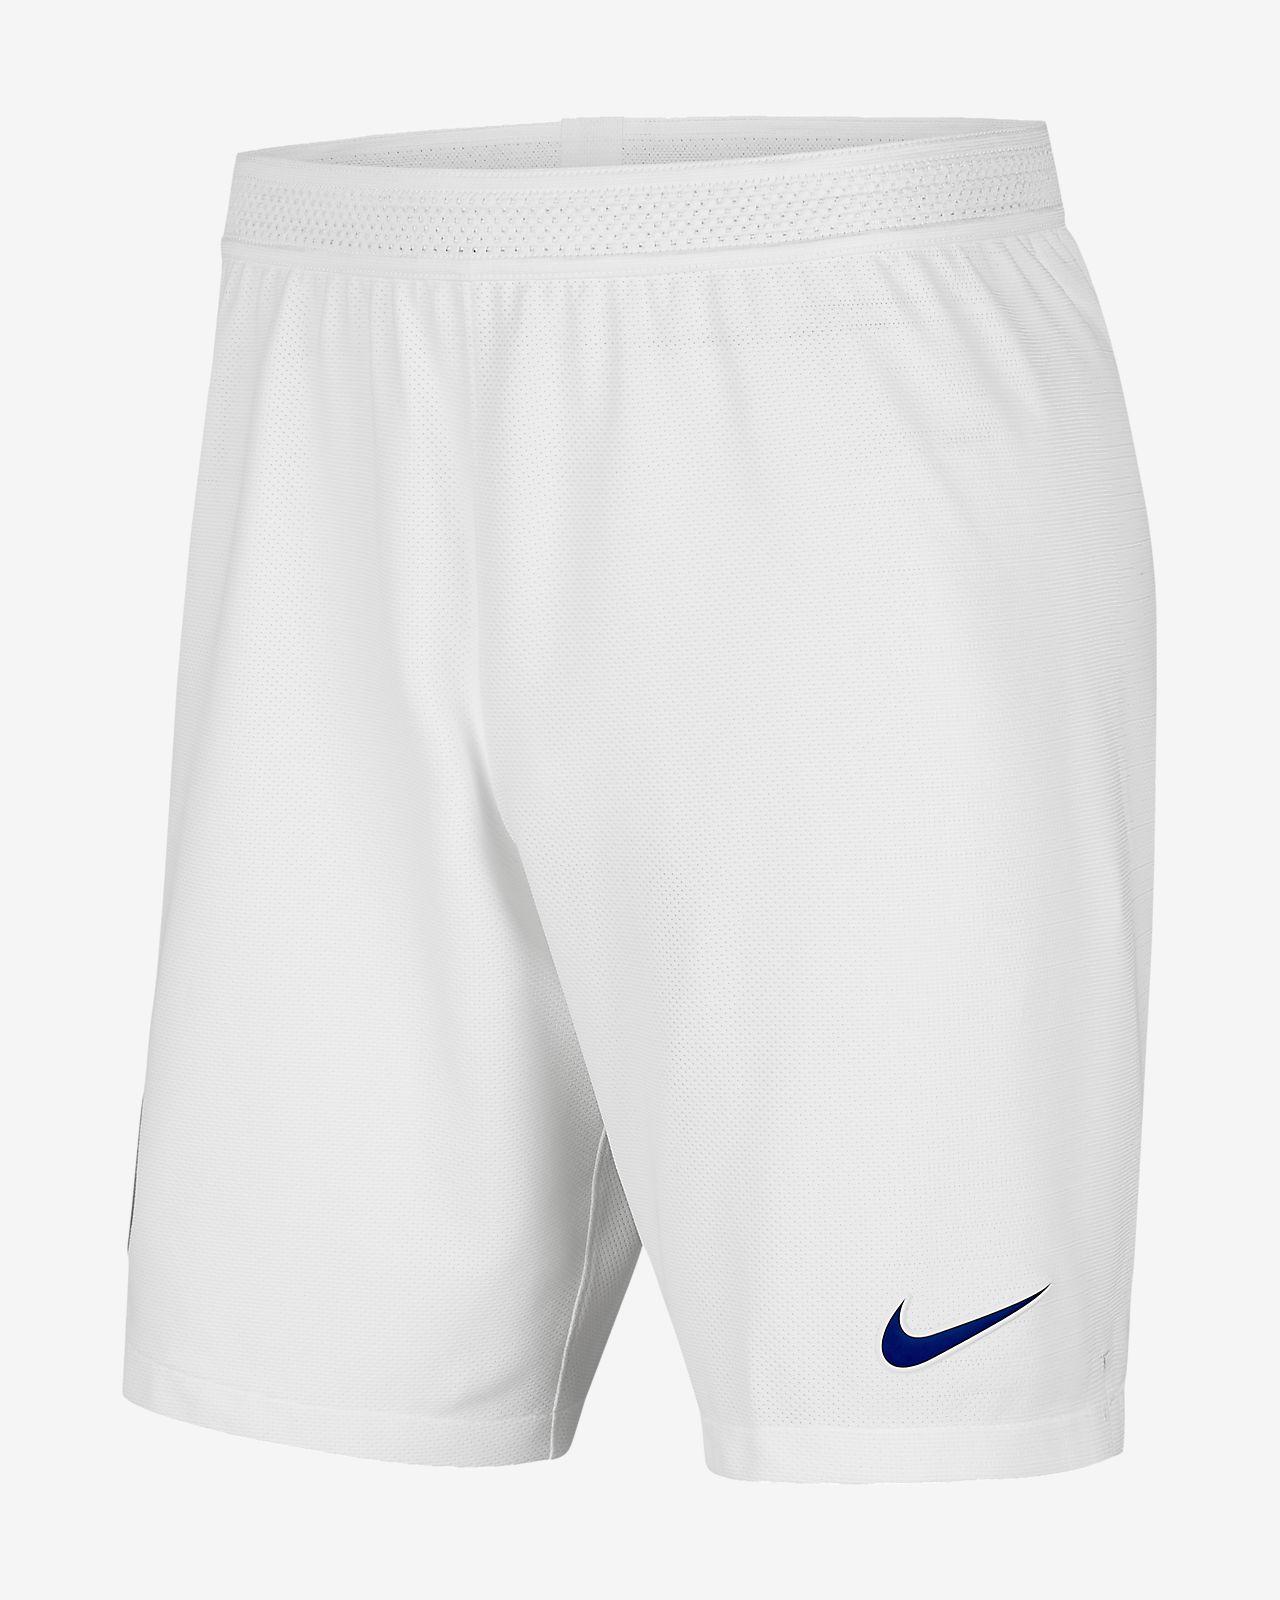 Chelsea FC 2019/20 Vapor Match Home/Away Pantalons curts de futbol - Home